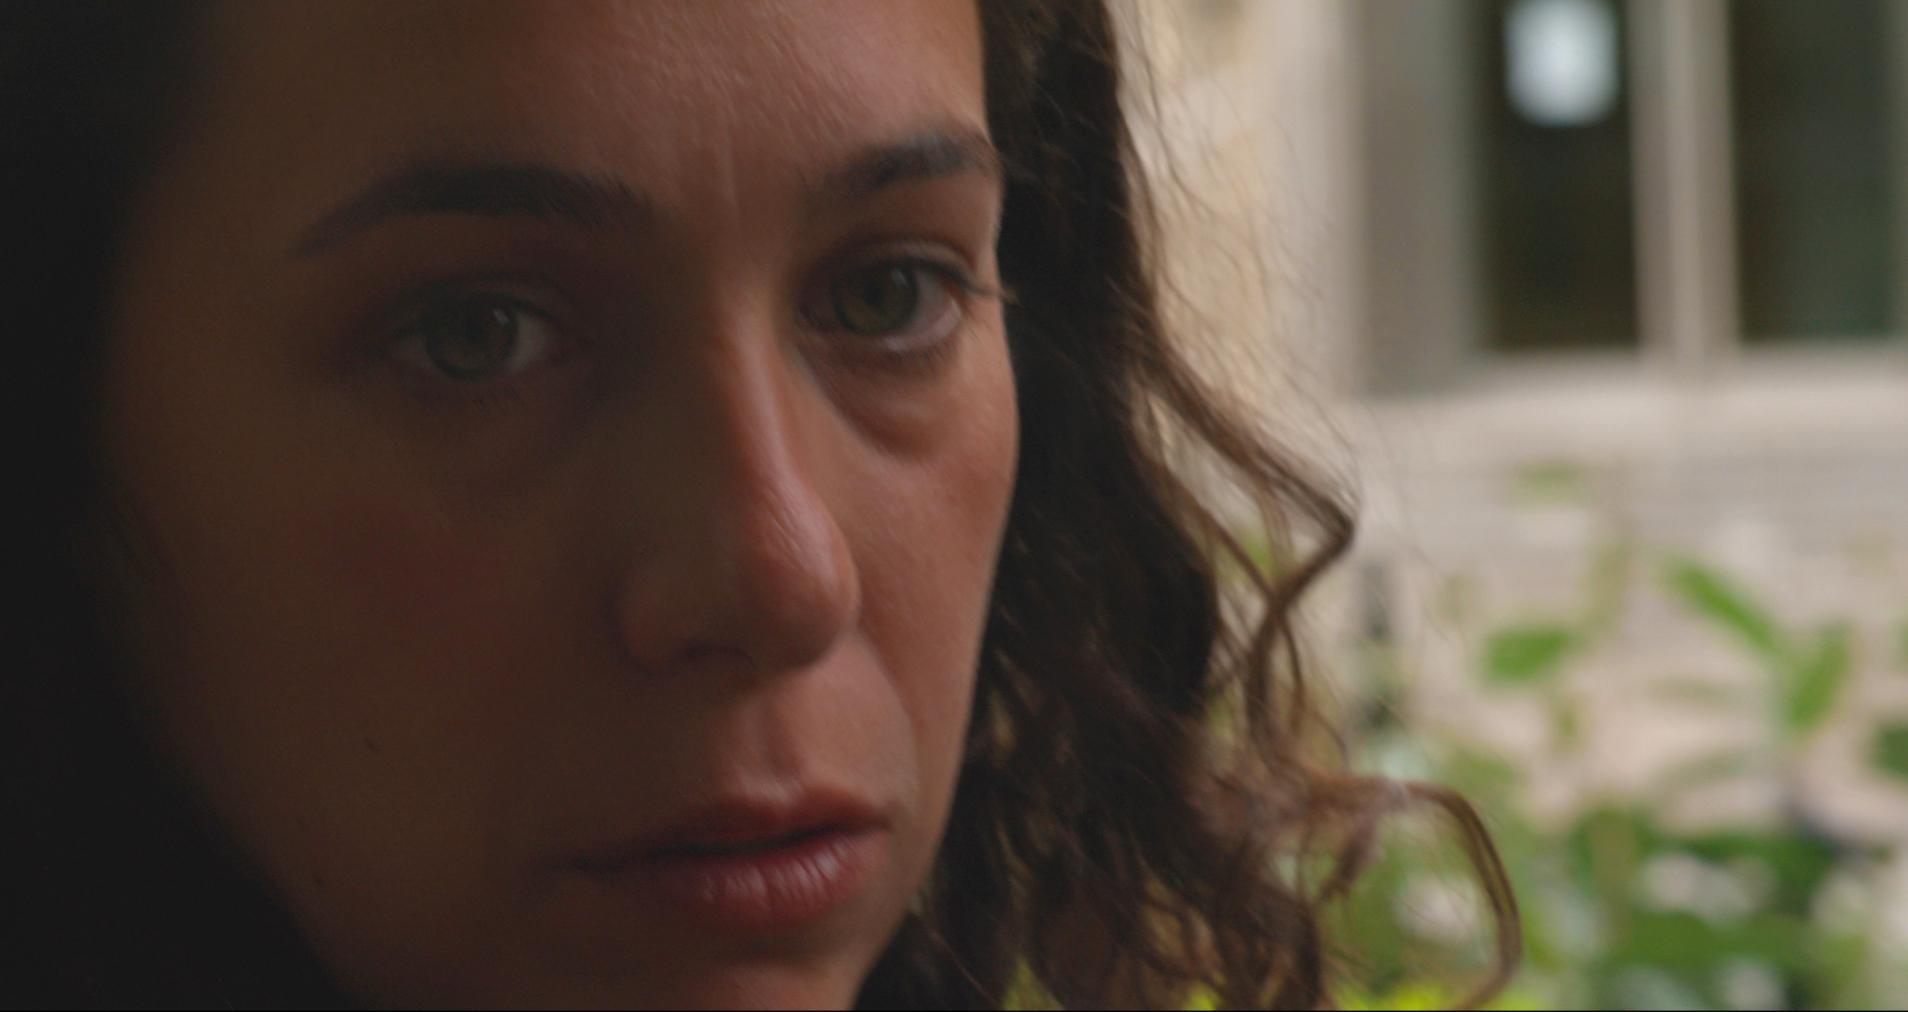 Paola Virgilio as Emma